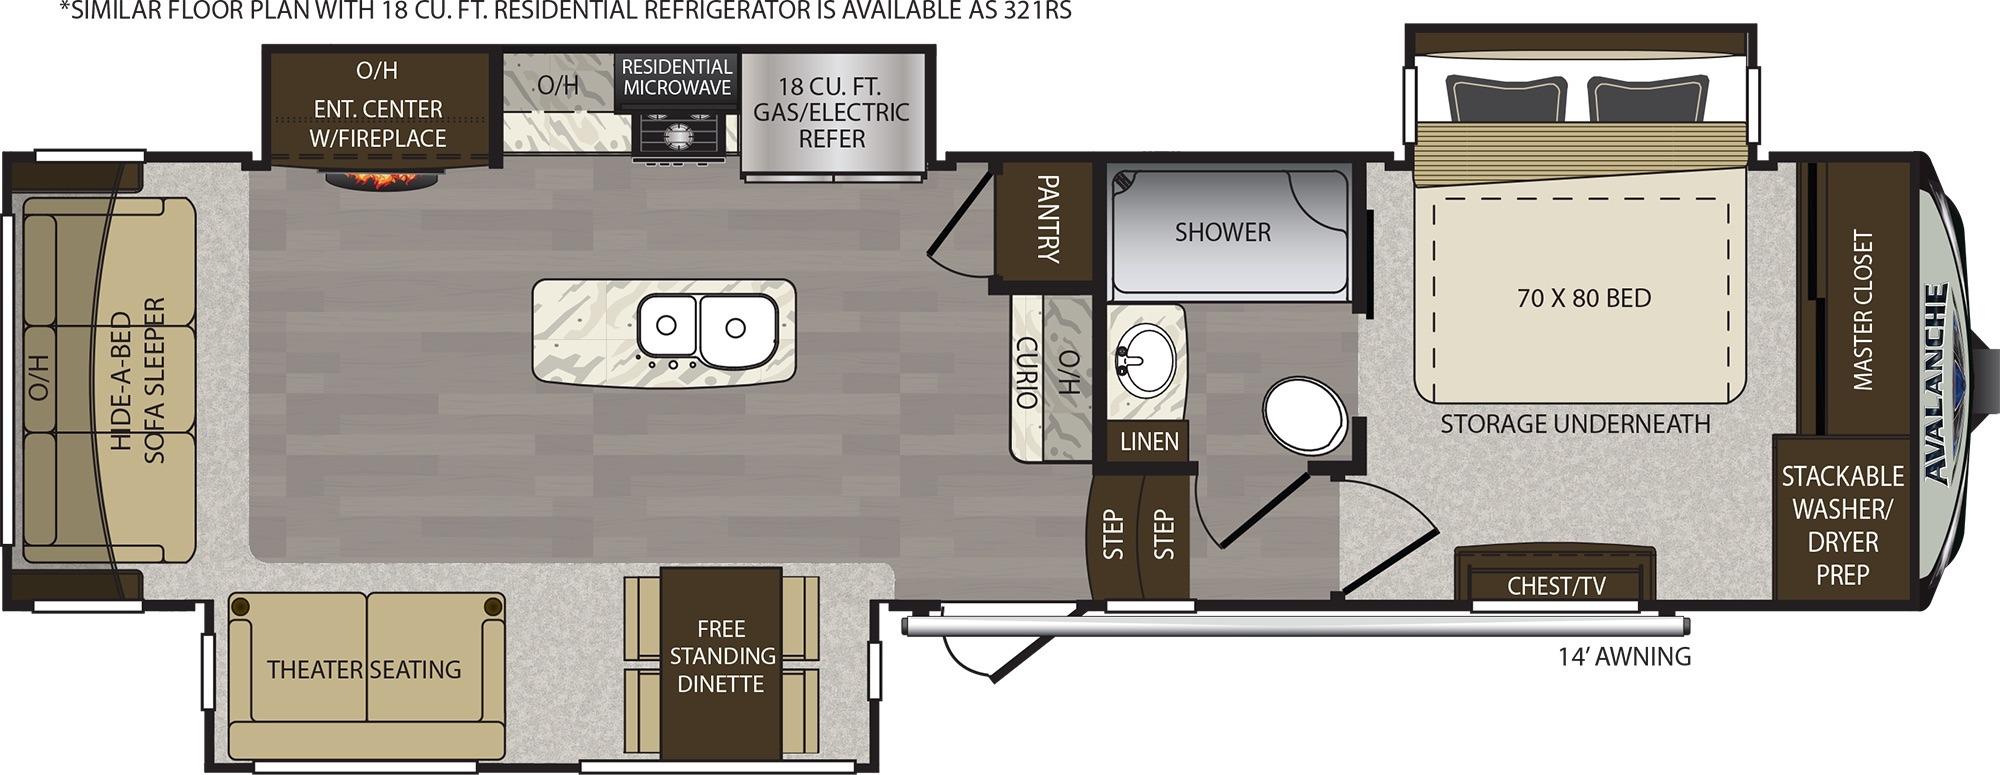 Bathroom : 2019-KEYSTONE-320RS